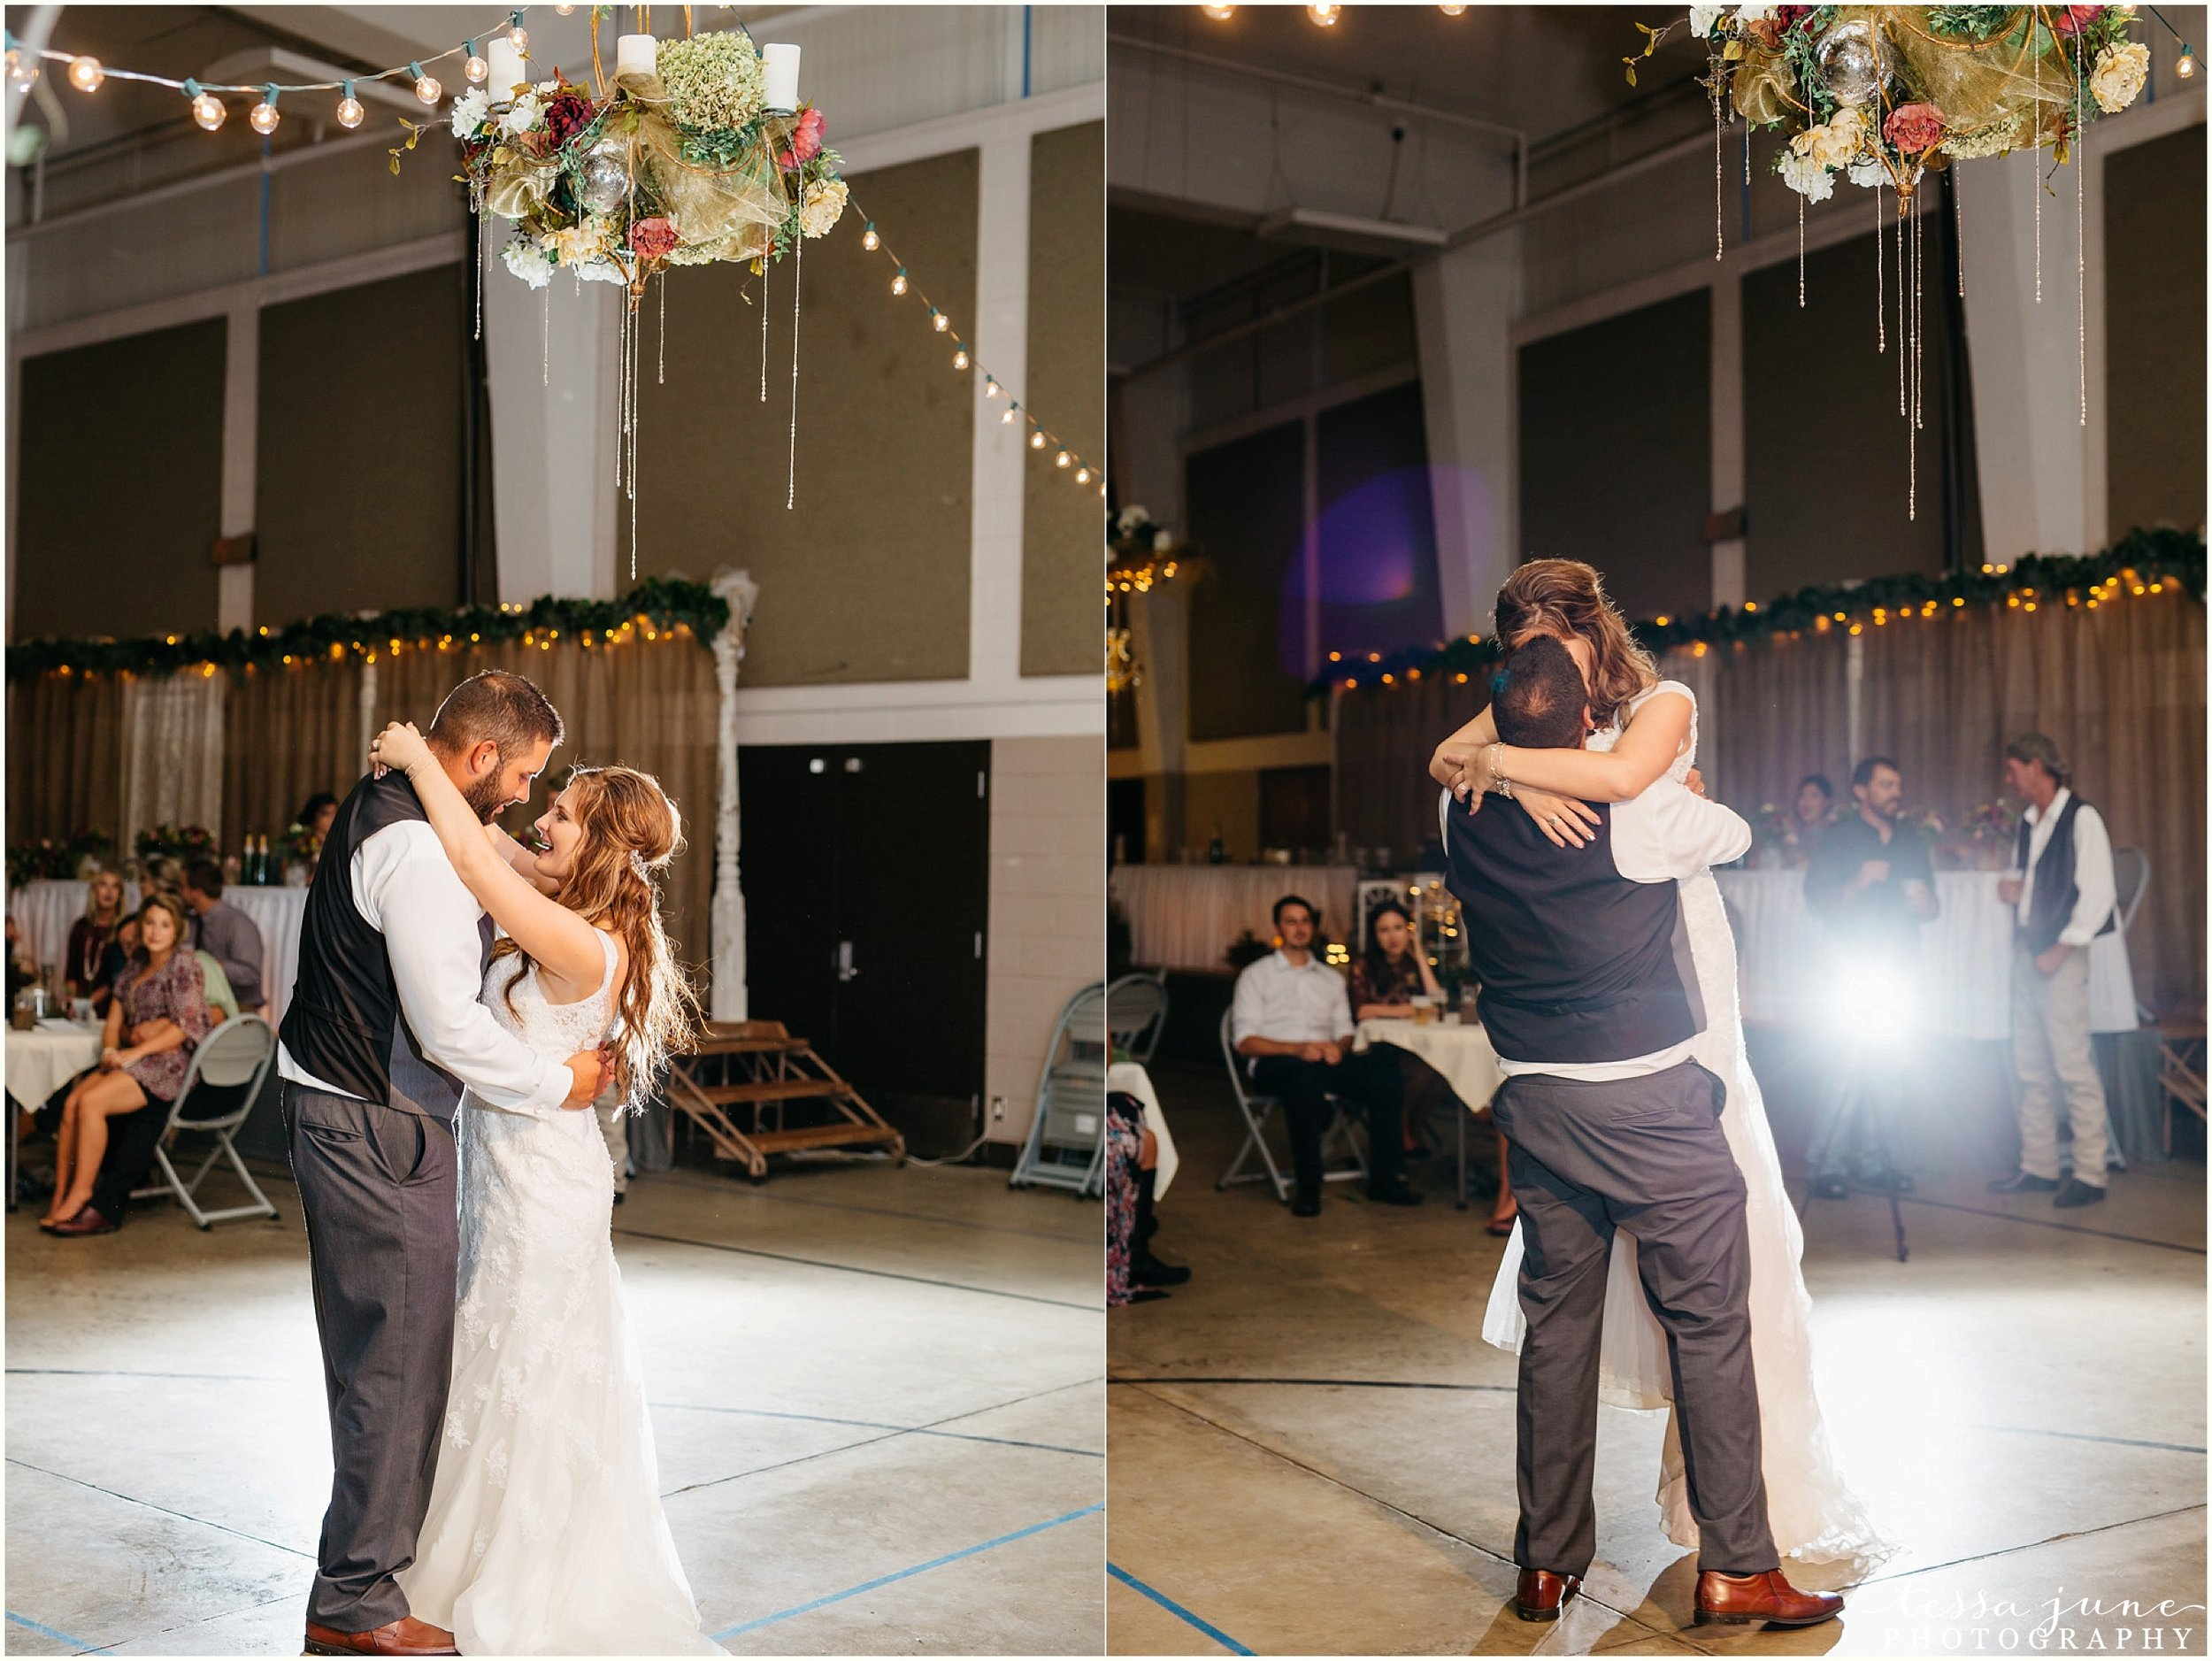 bohemian-minnesota-wedding-mismatched-bridesmaid-dresses-waterfall-st-cloud-tessa-june-photography-191.jpg